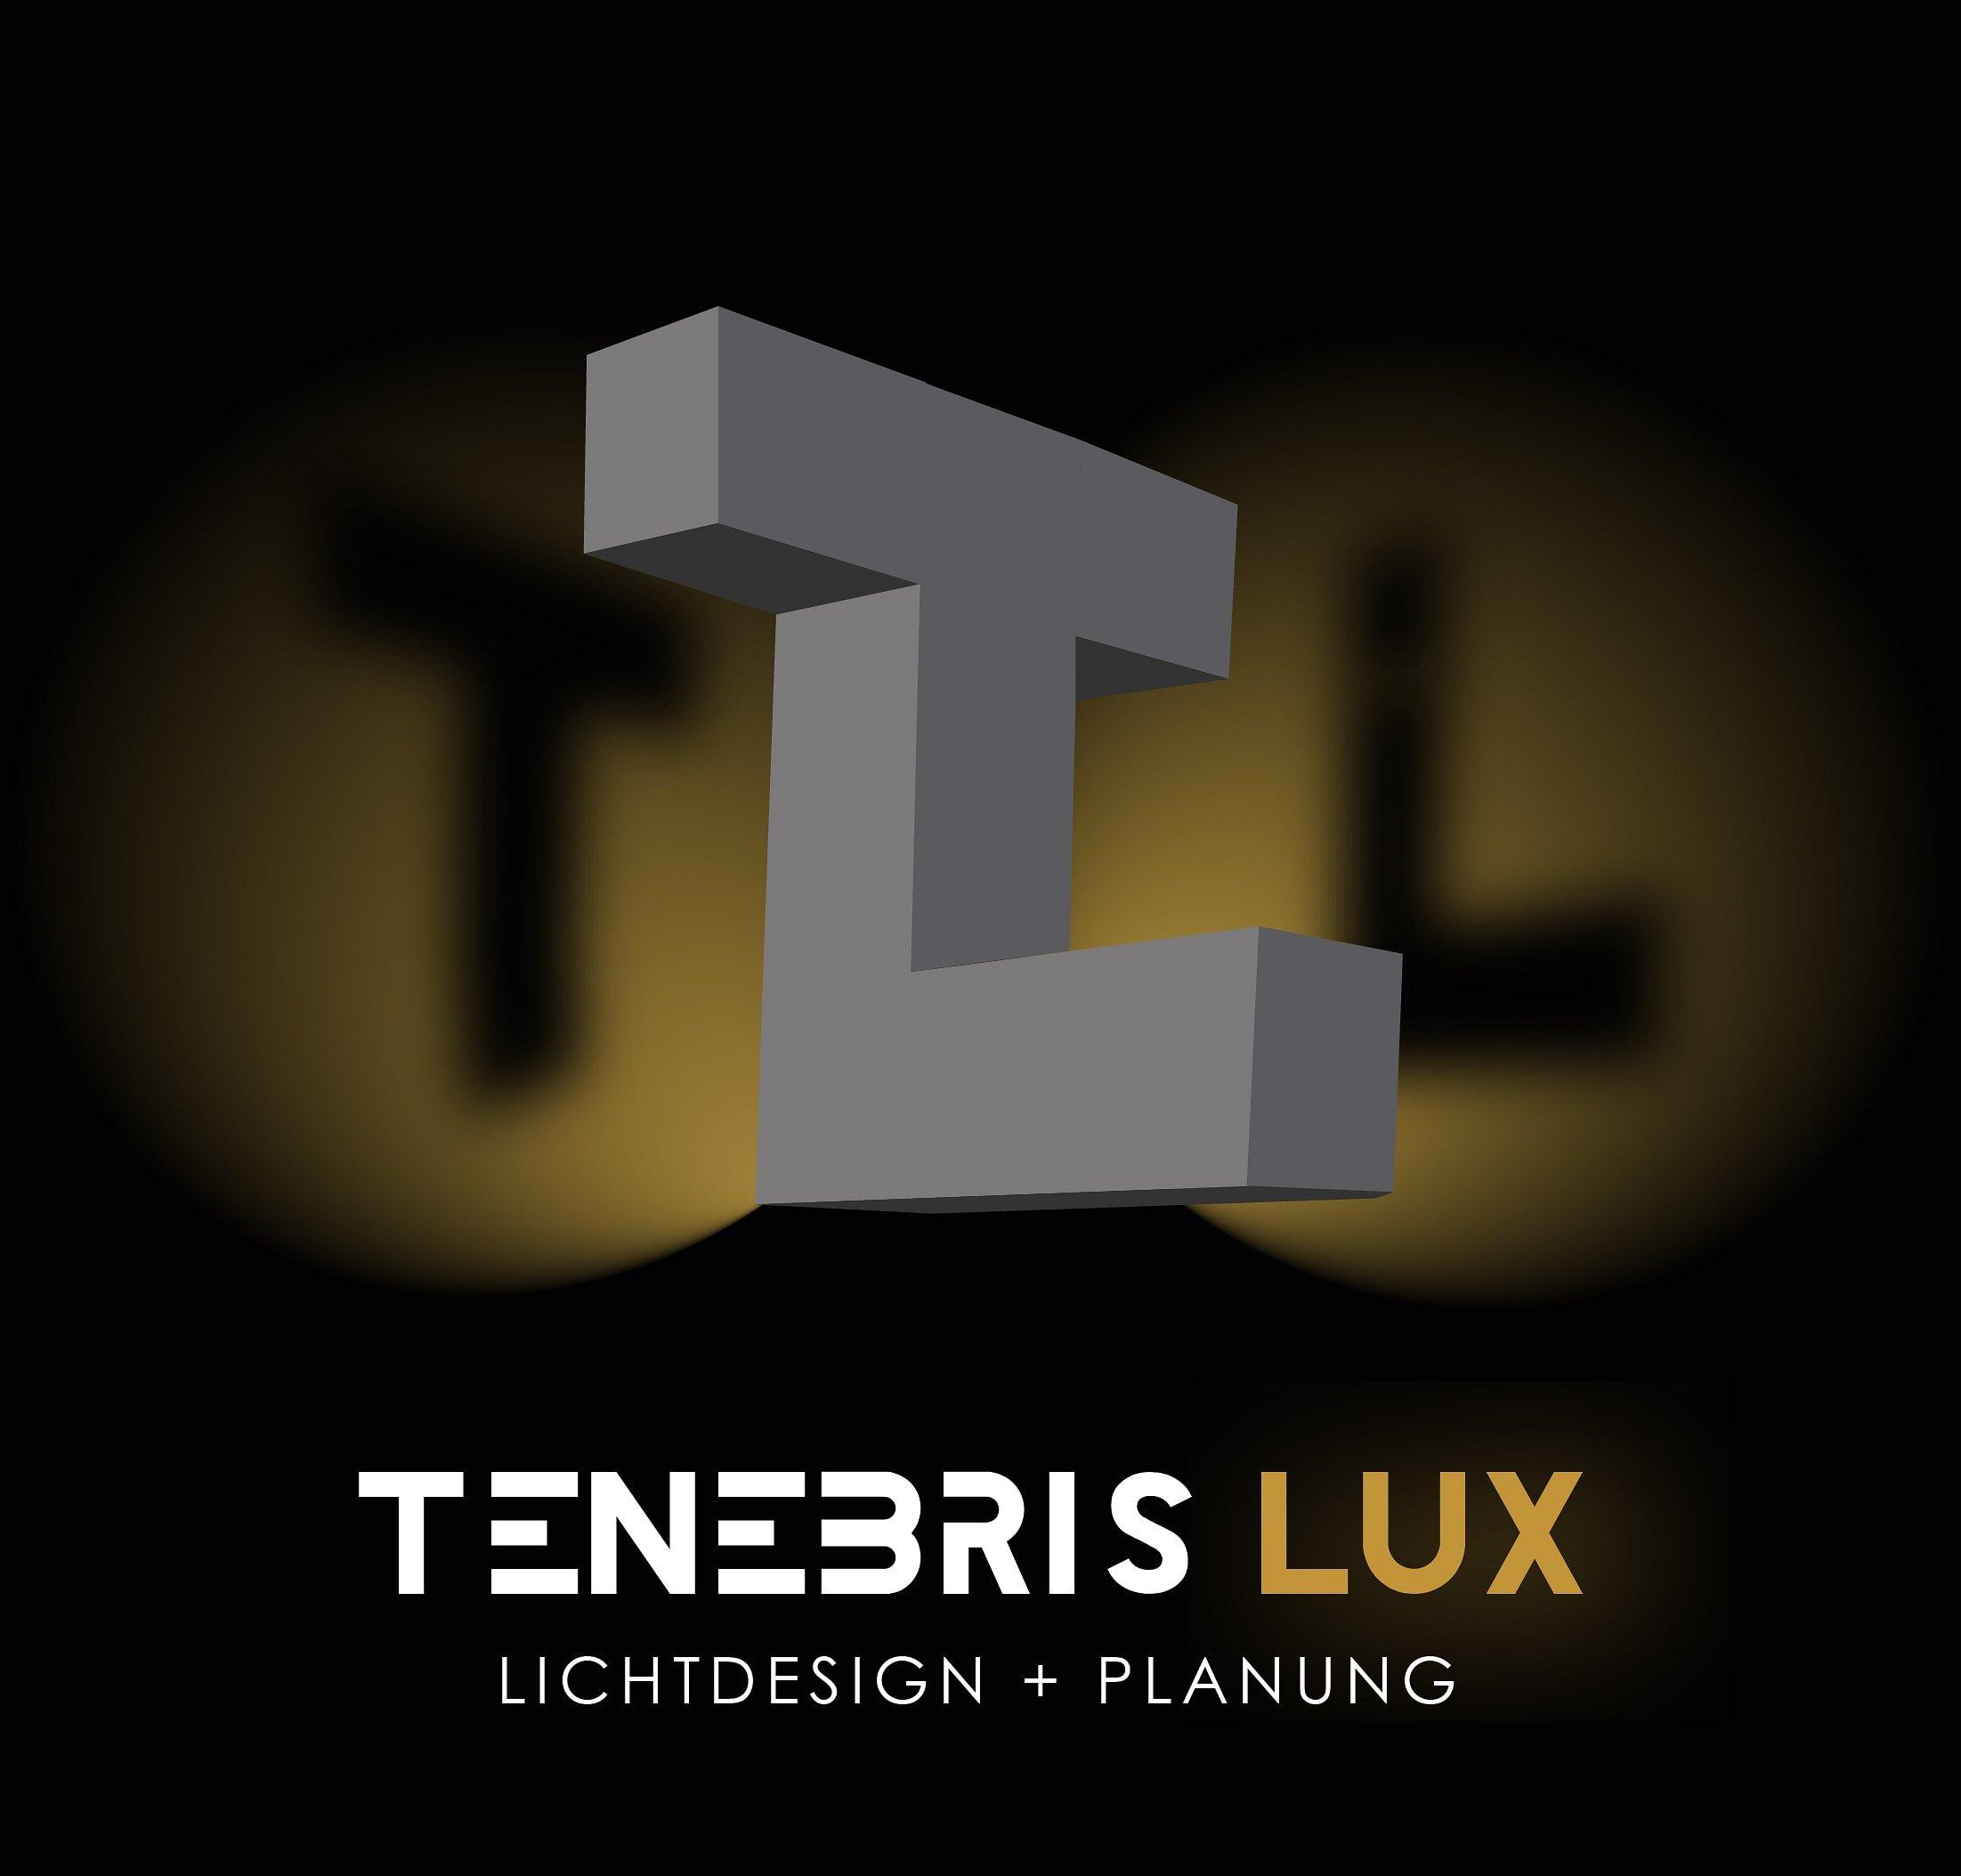 TENEBRIS LUX GmbH